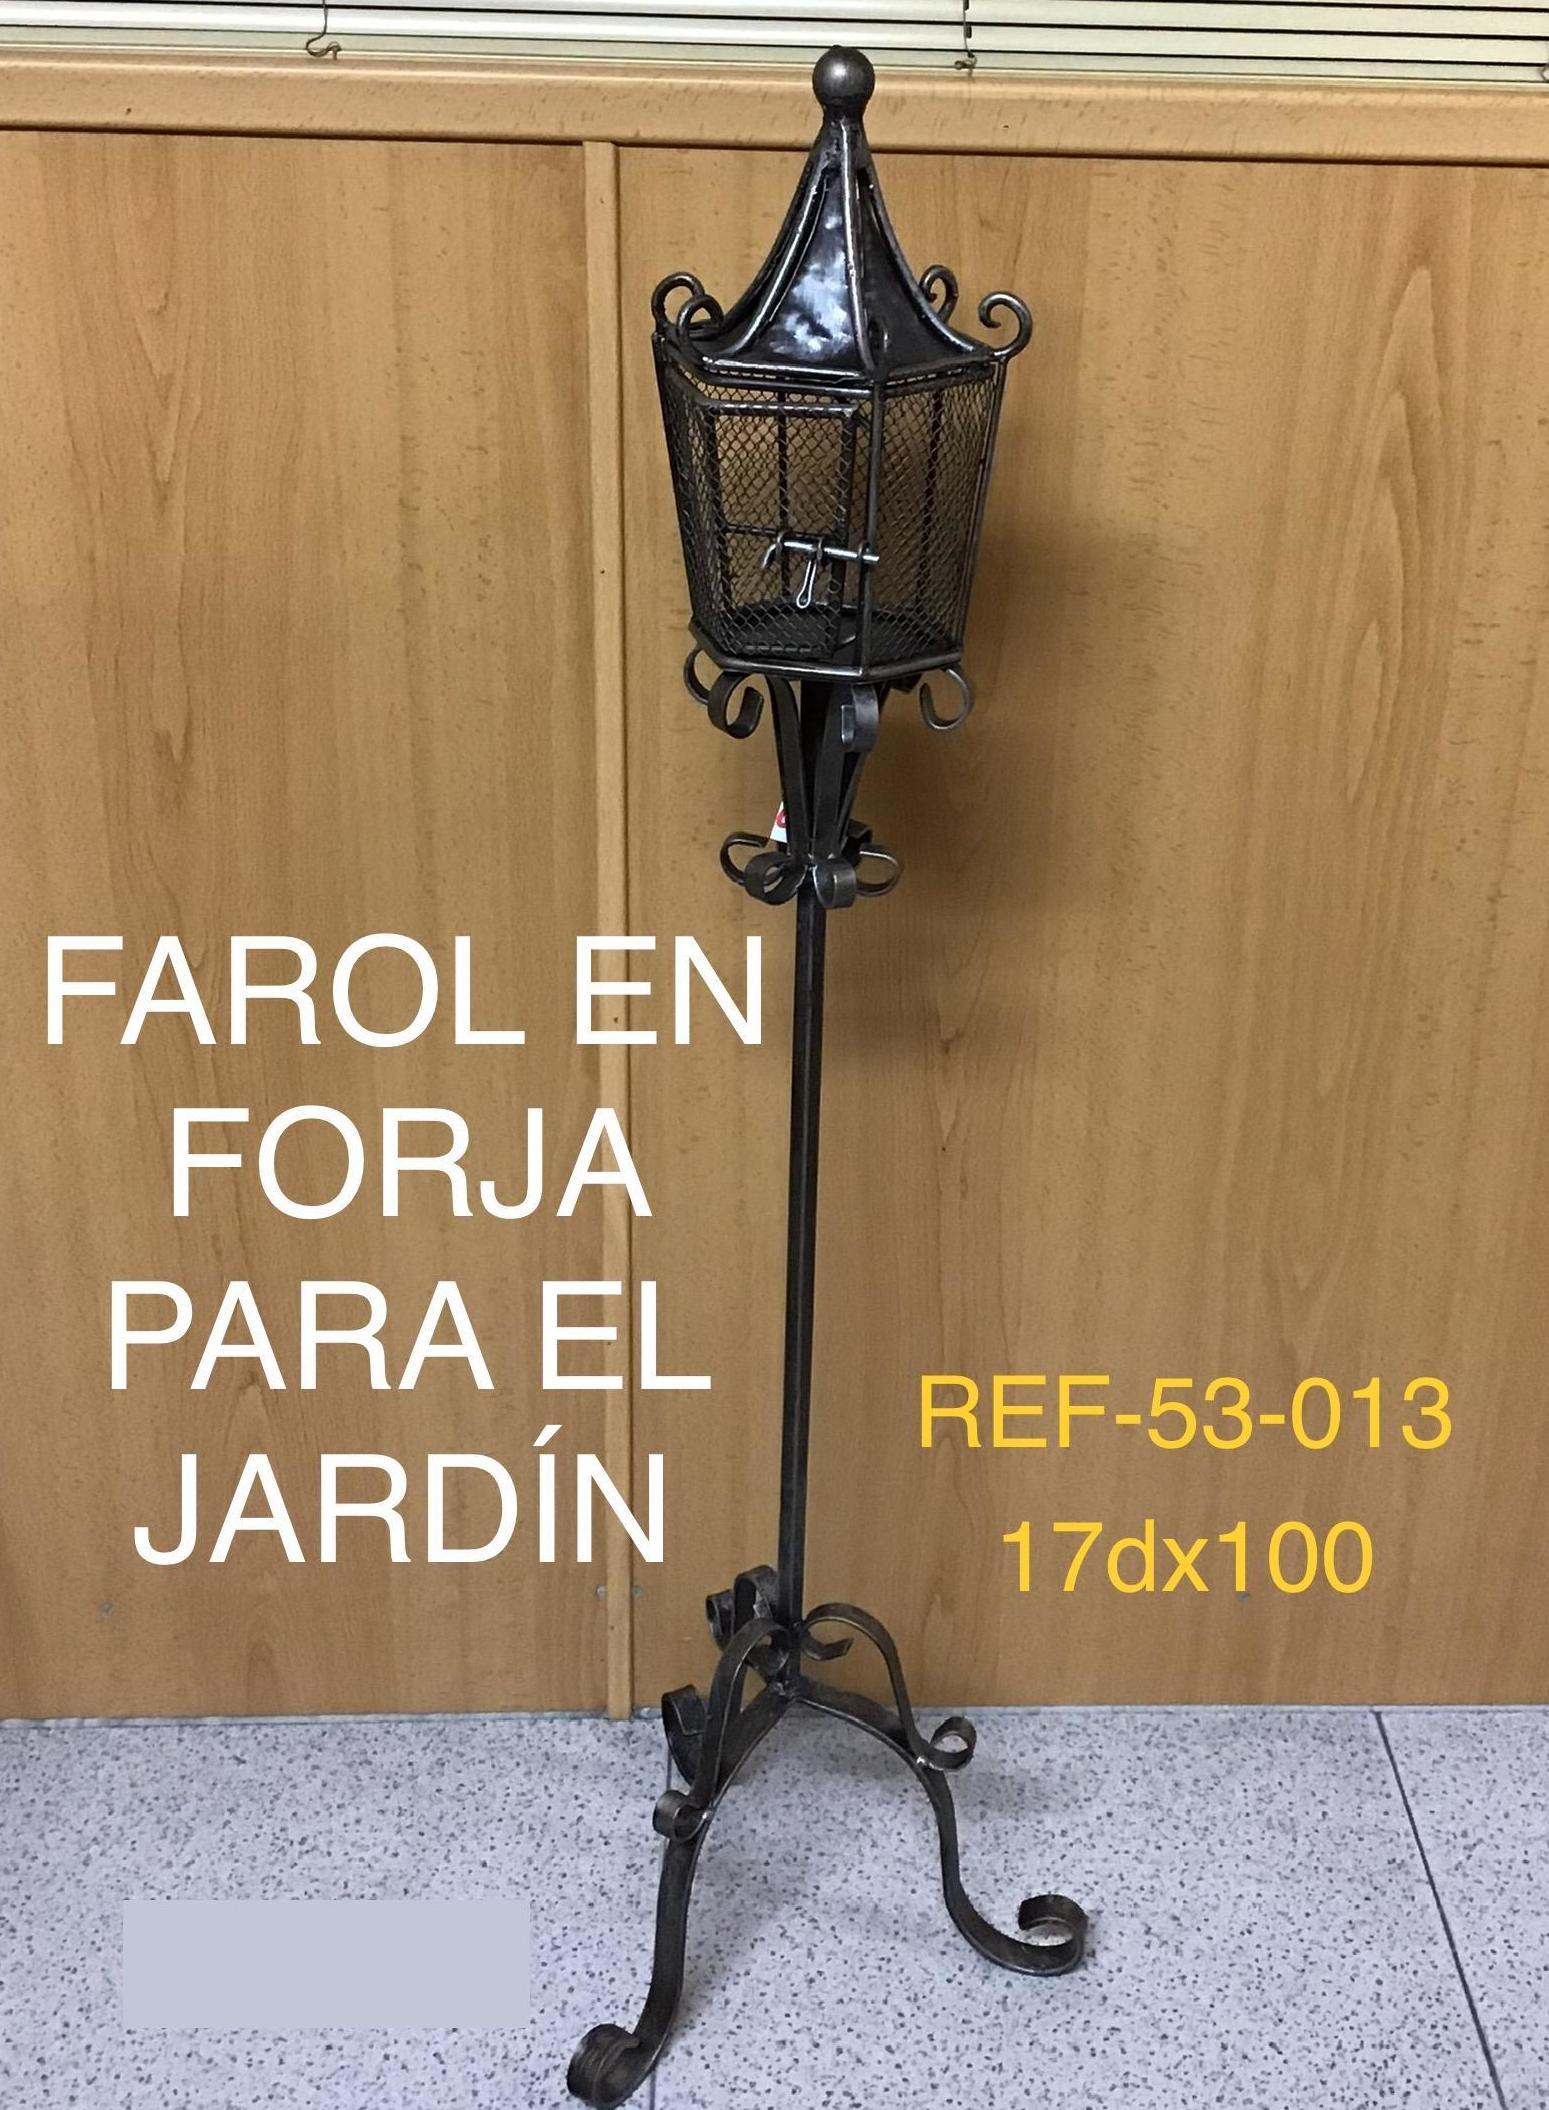 CANDELABRO DE PIE 27DX135